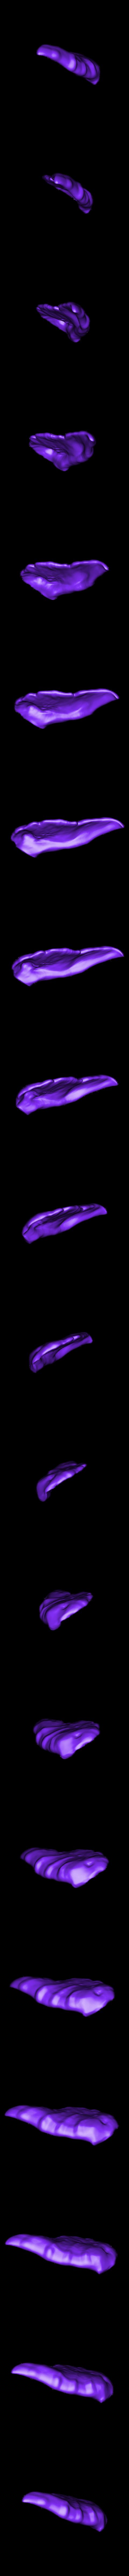 Stripe_right_ear.stl Download free STL file Stripe Gremlin • 3D printer model, 3rdesignworks